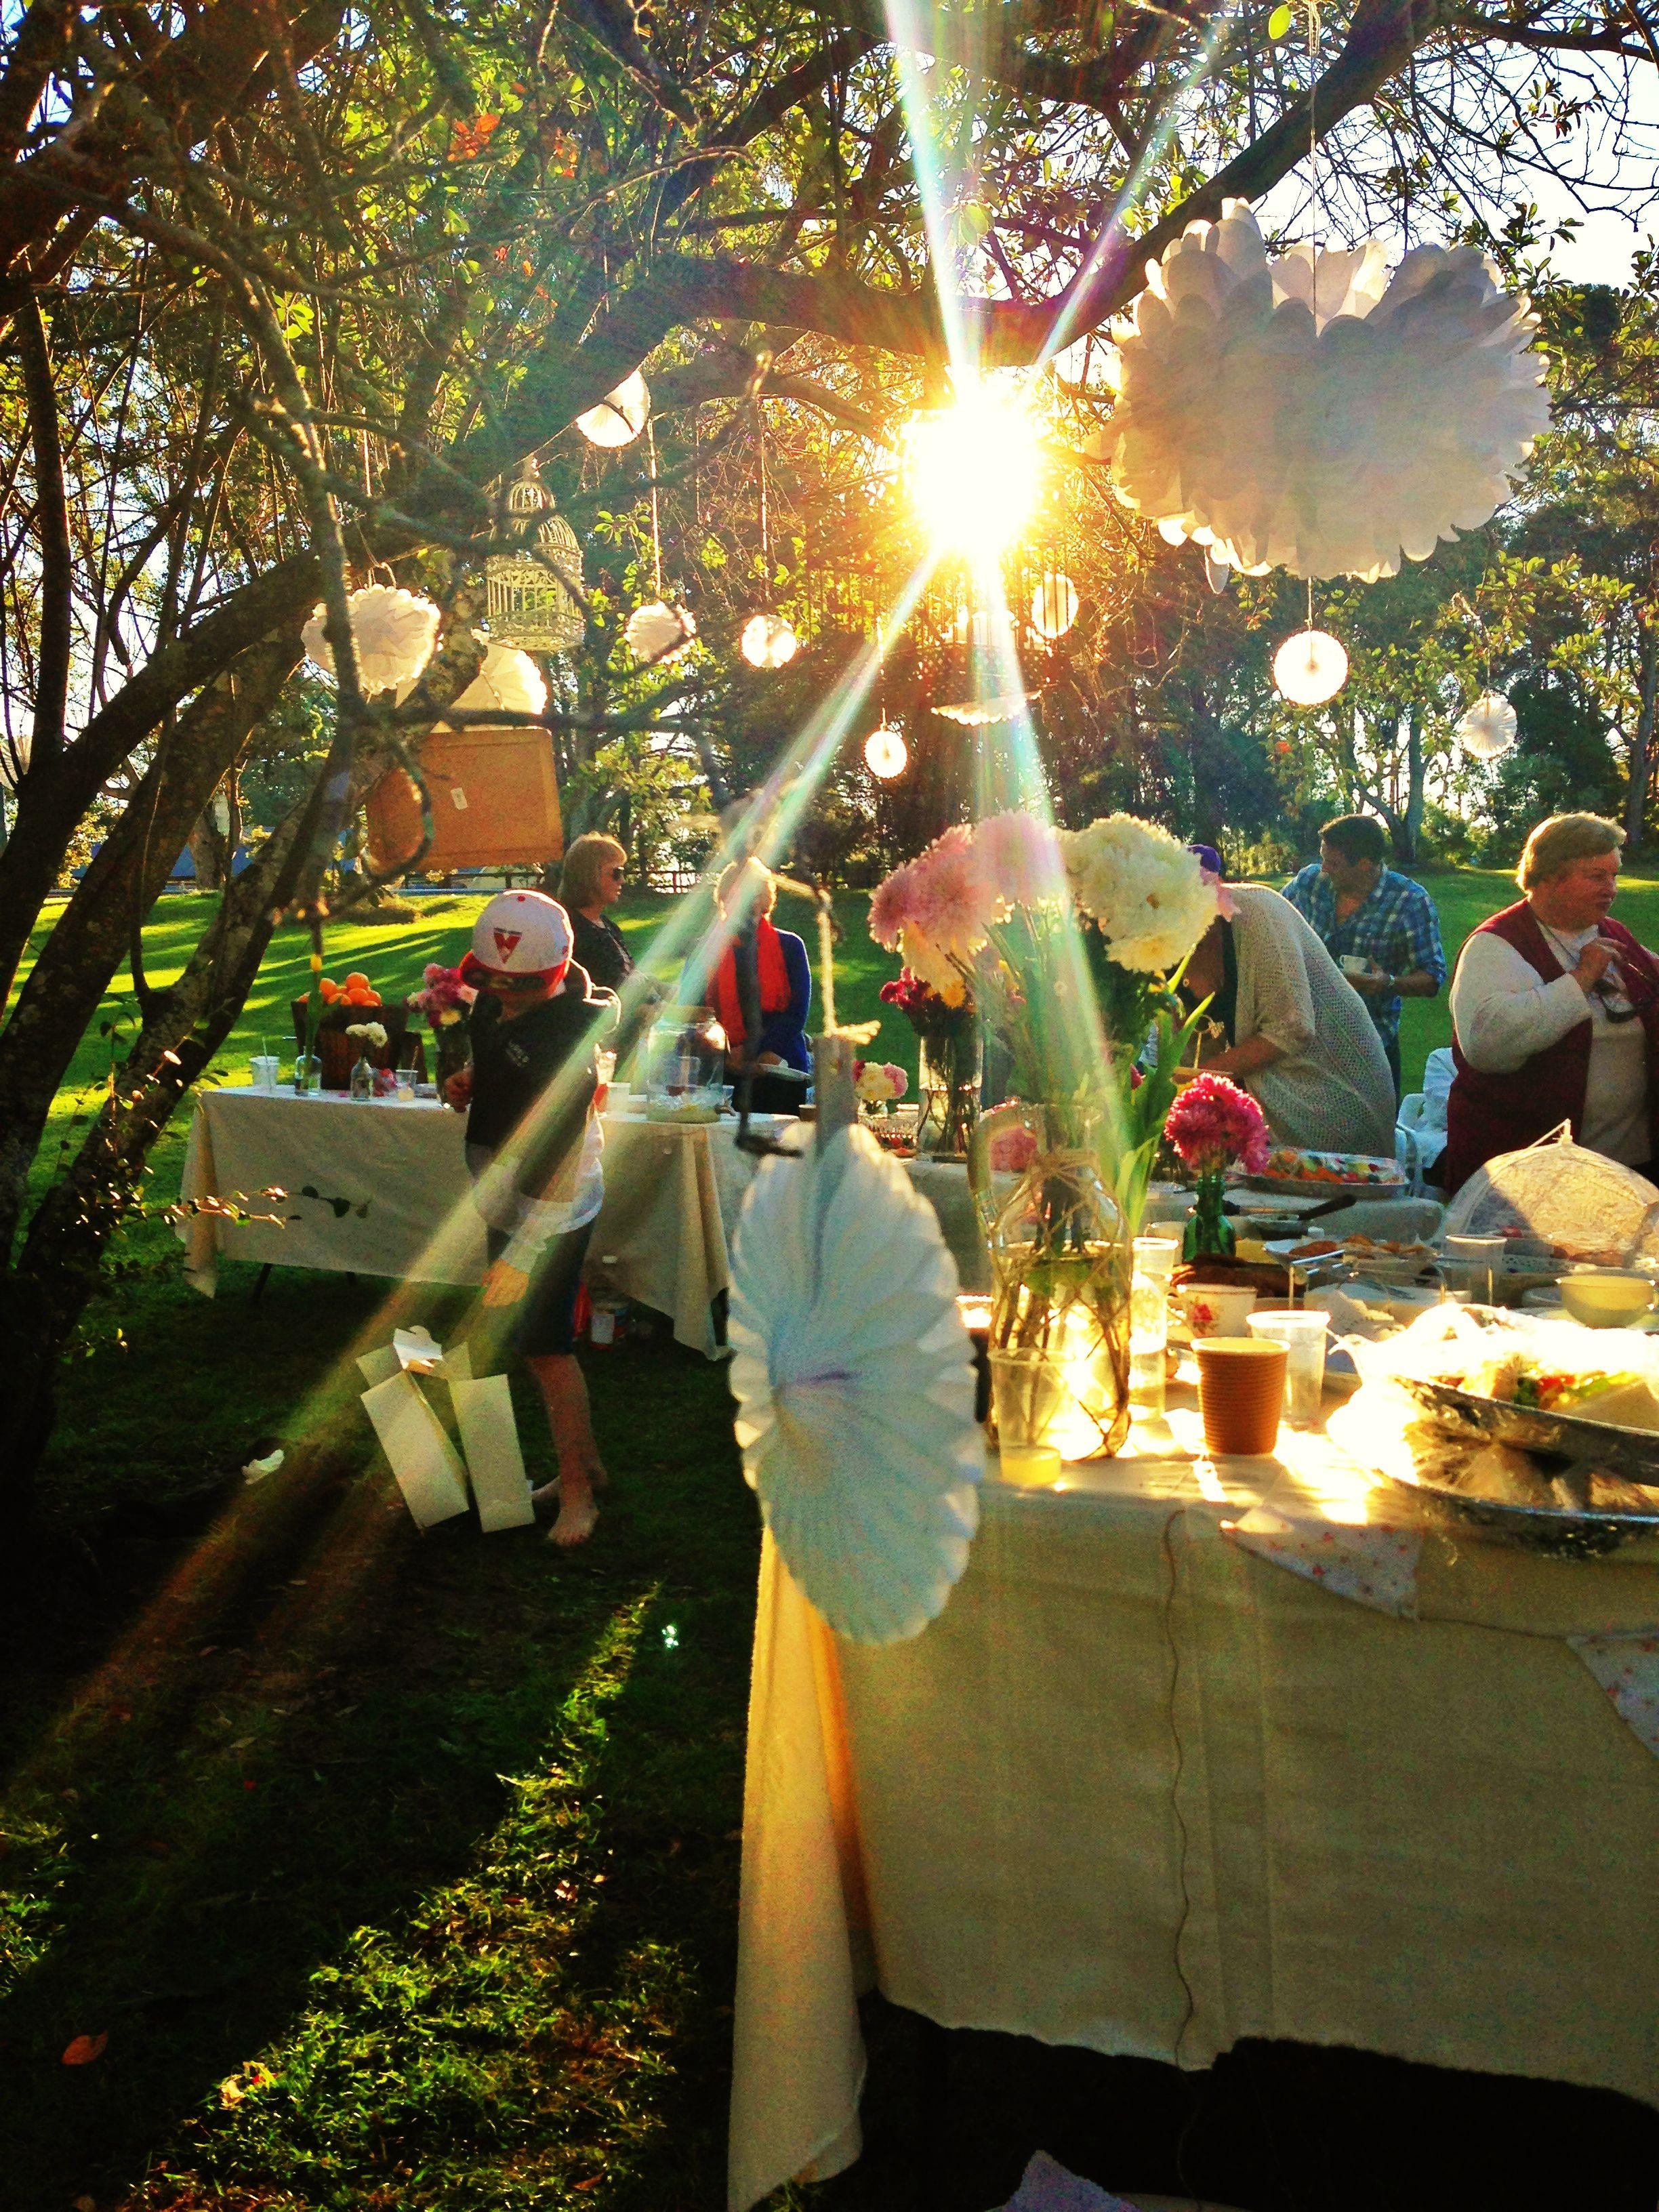 90th vintage picnic party